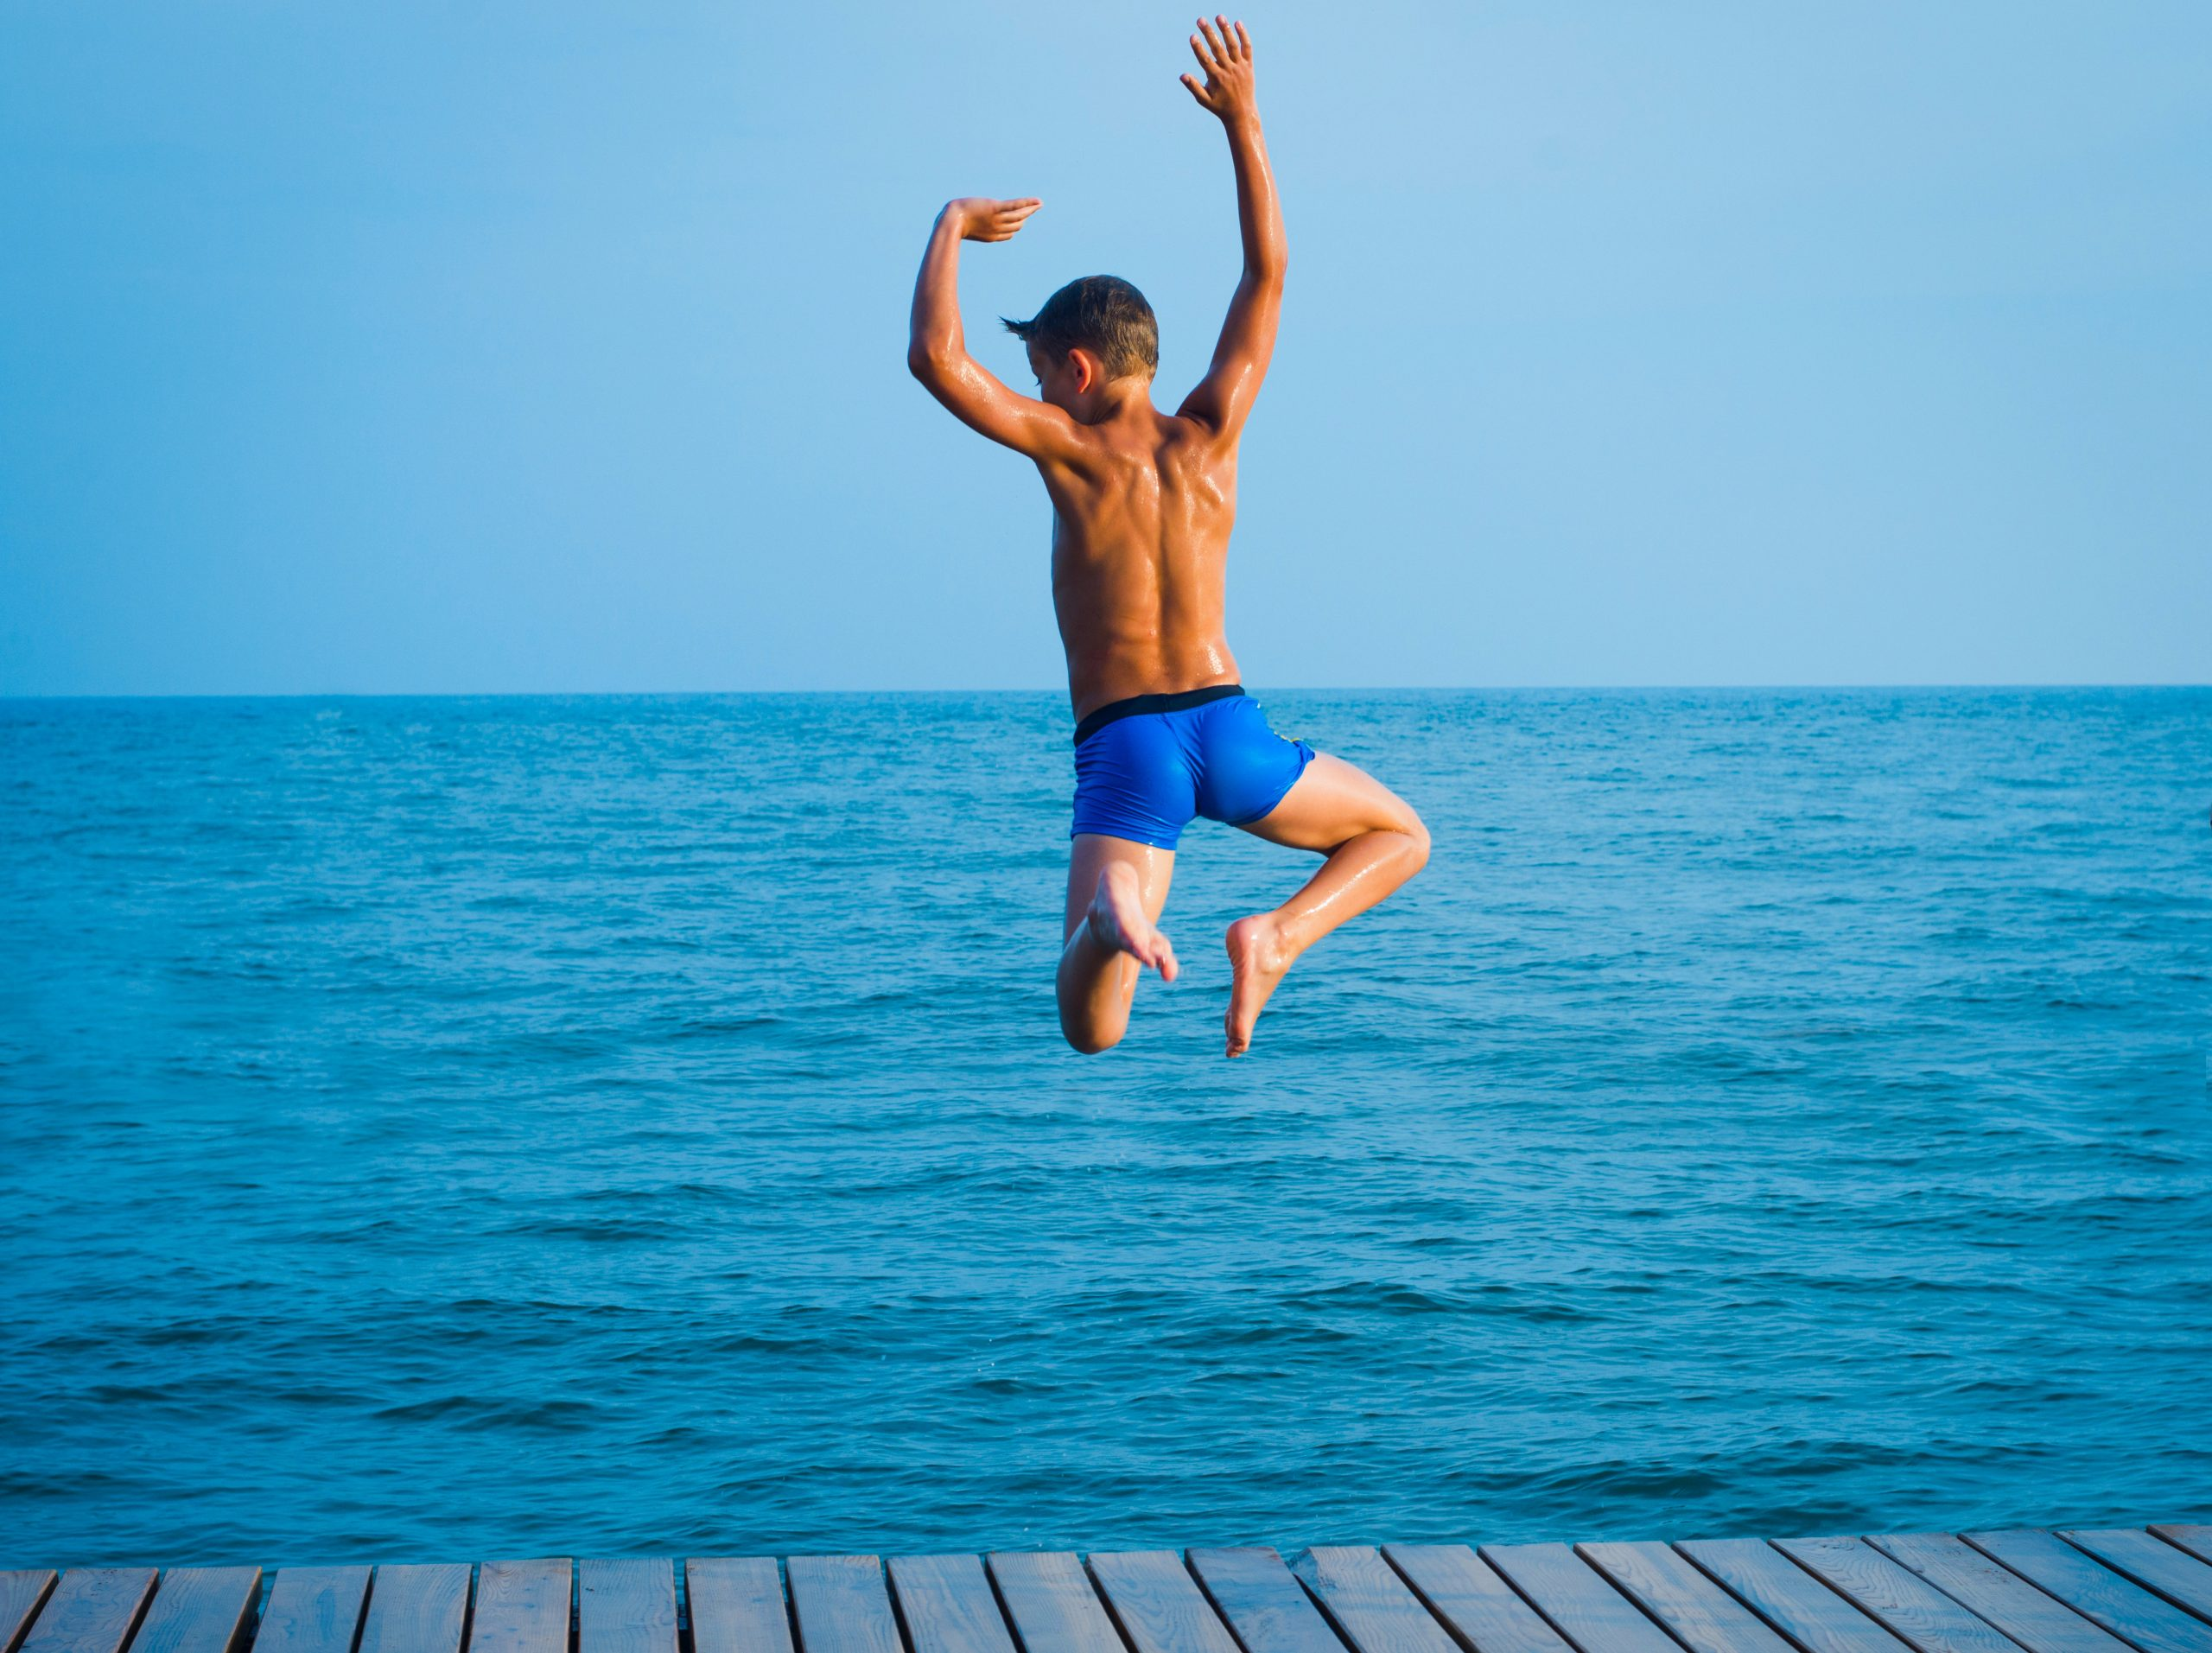 Niño saltando playa